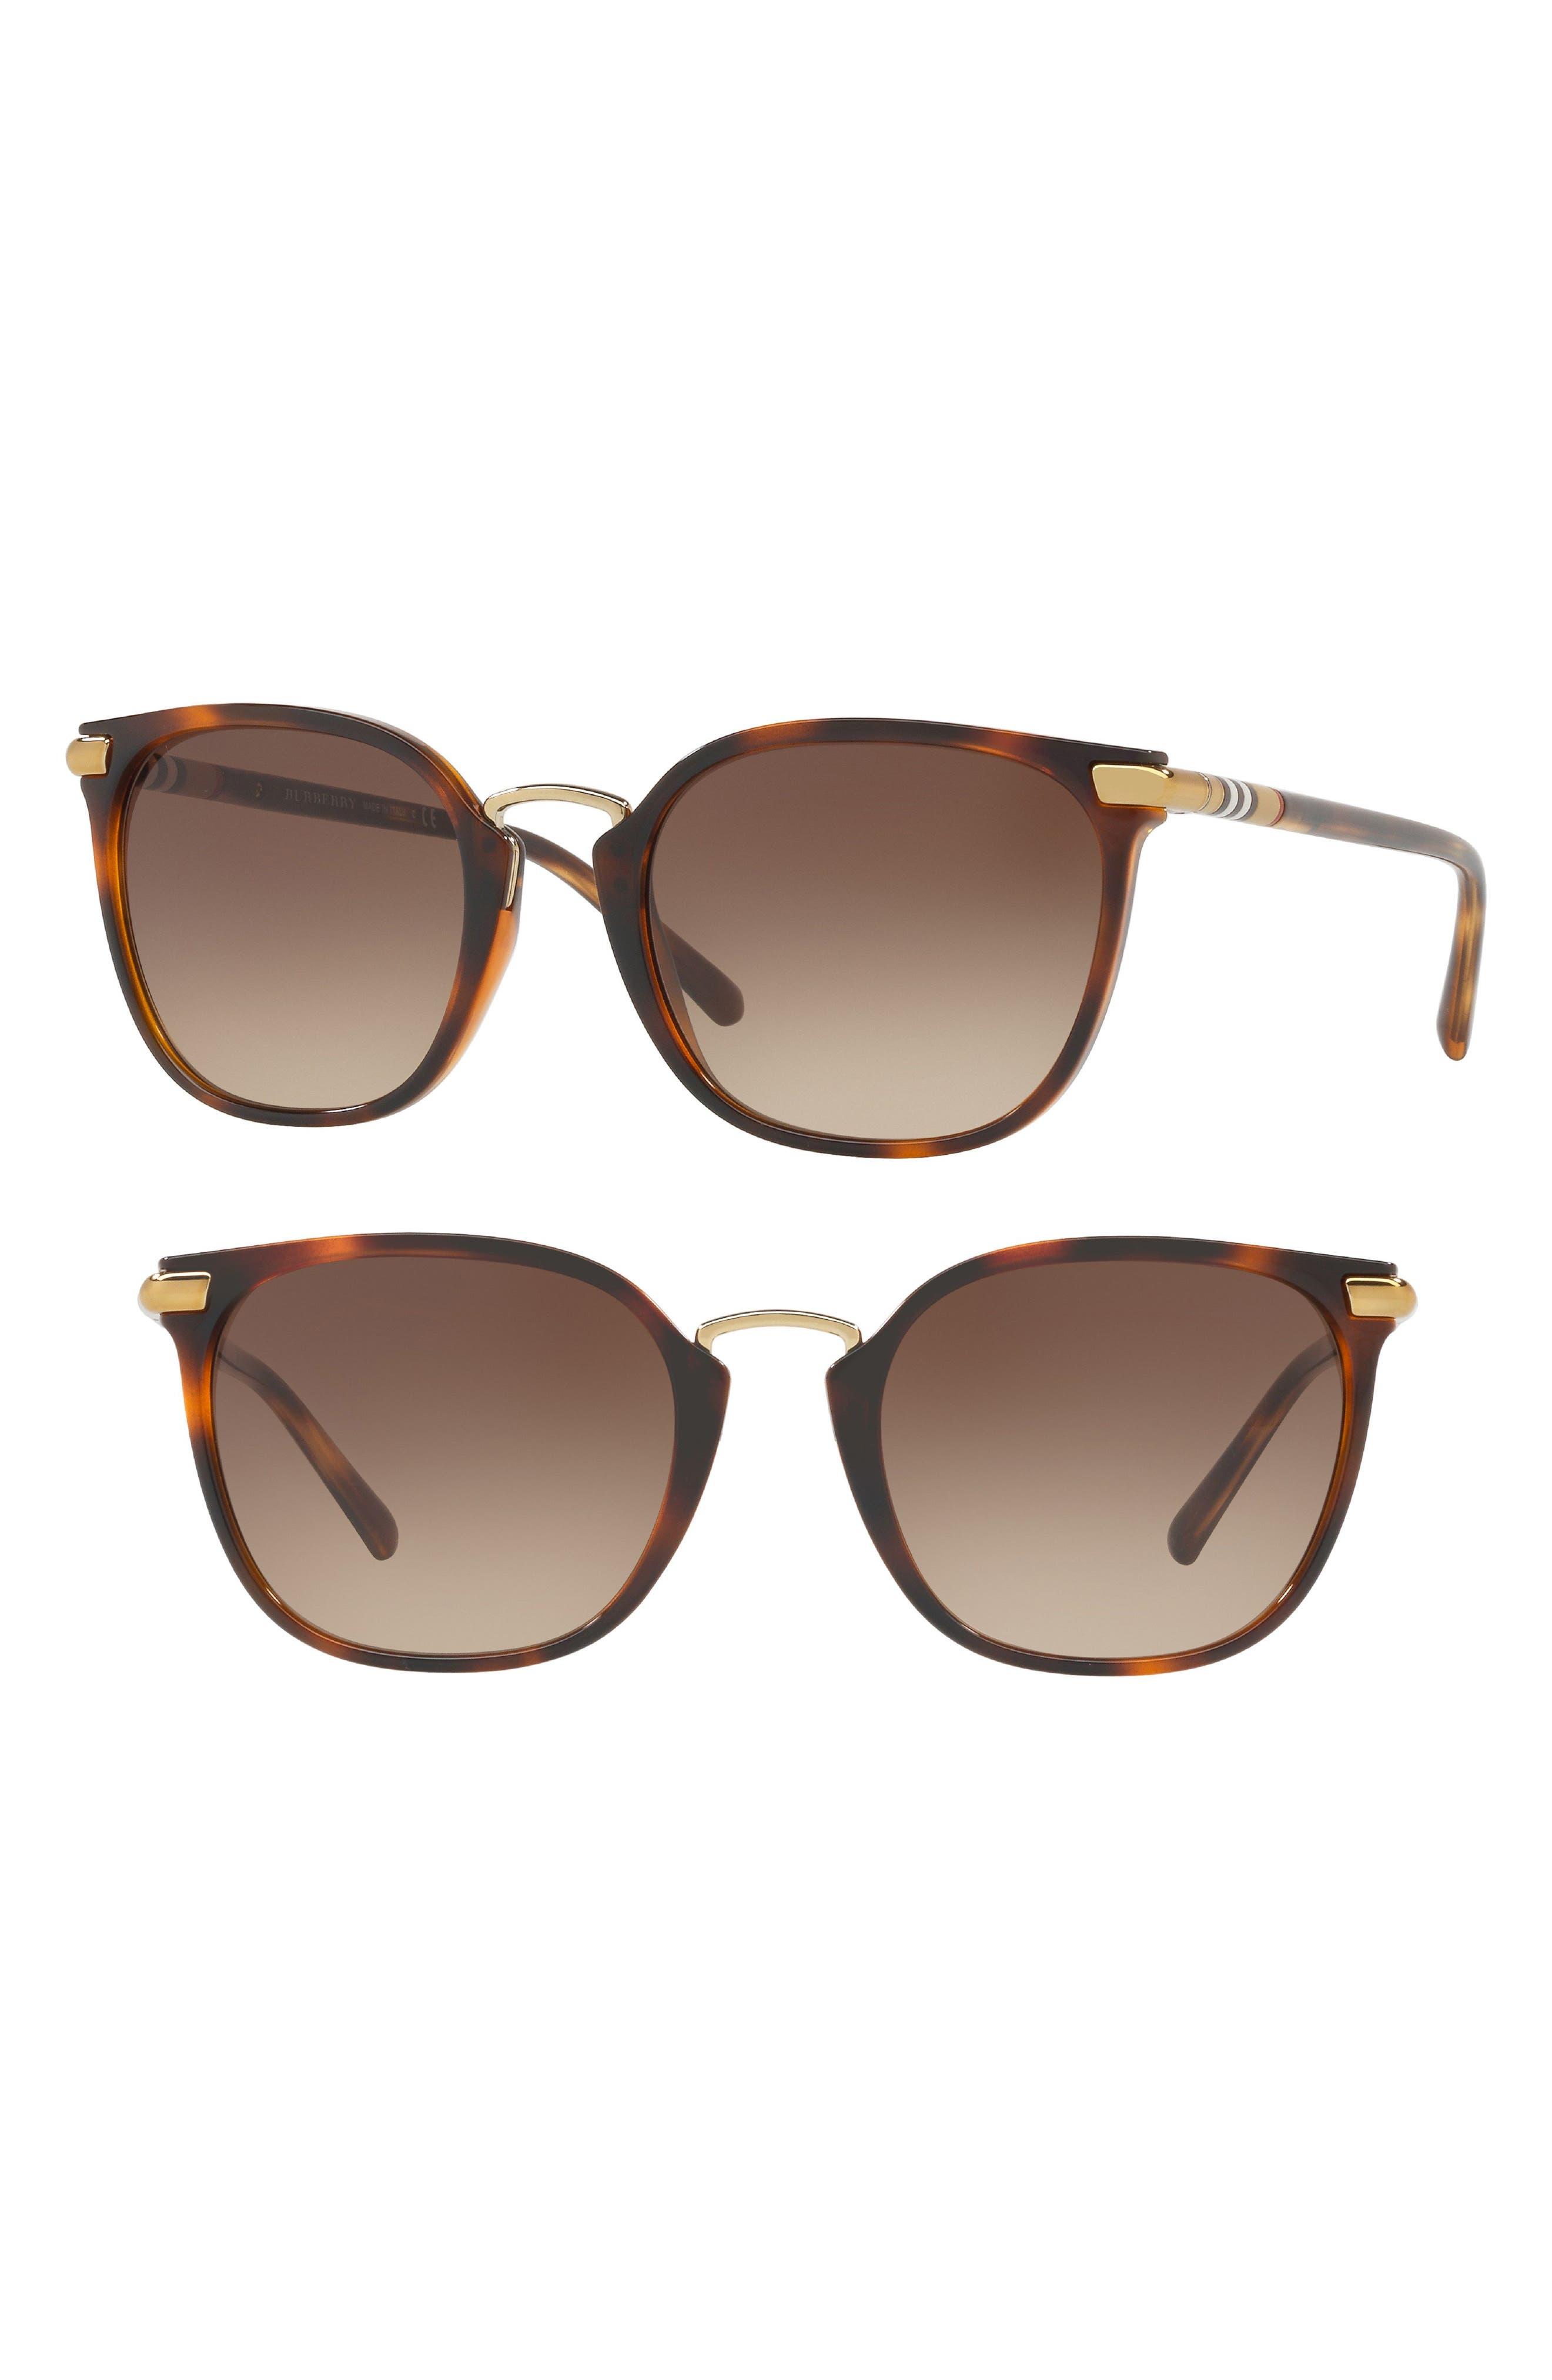 53mm Gradient Square Sunglasses,                             Alternate thumbnail 5, color,